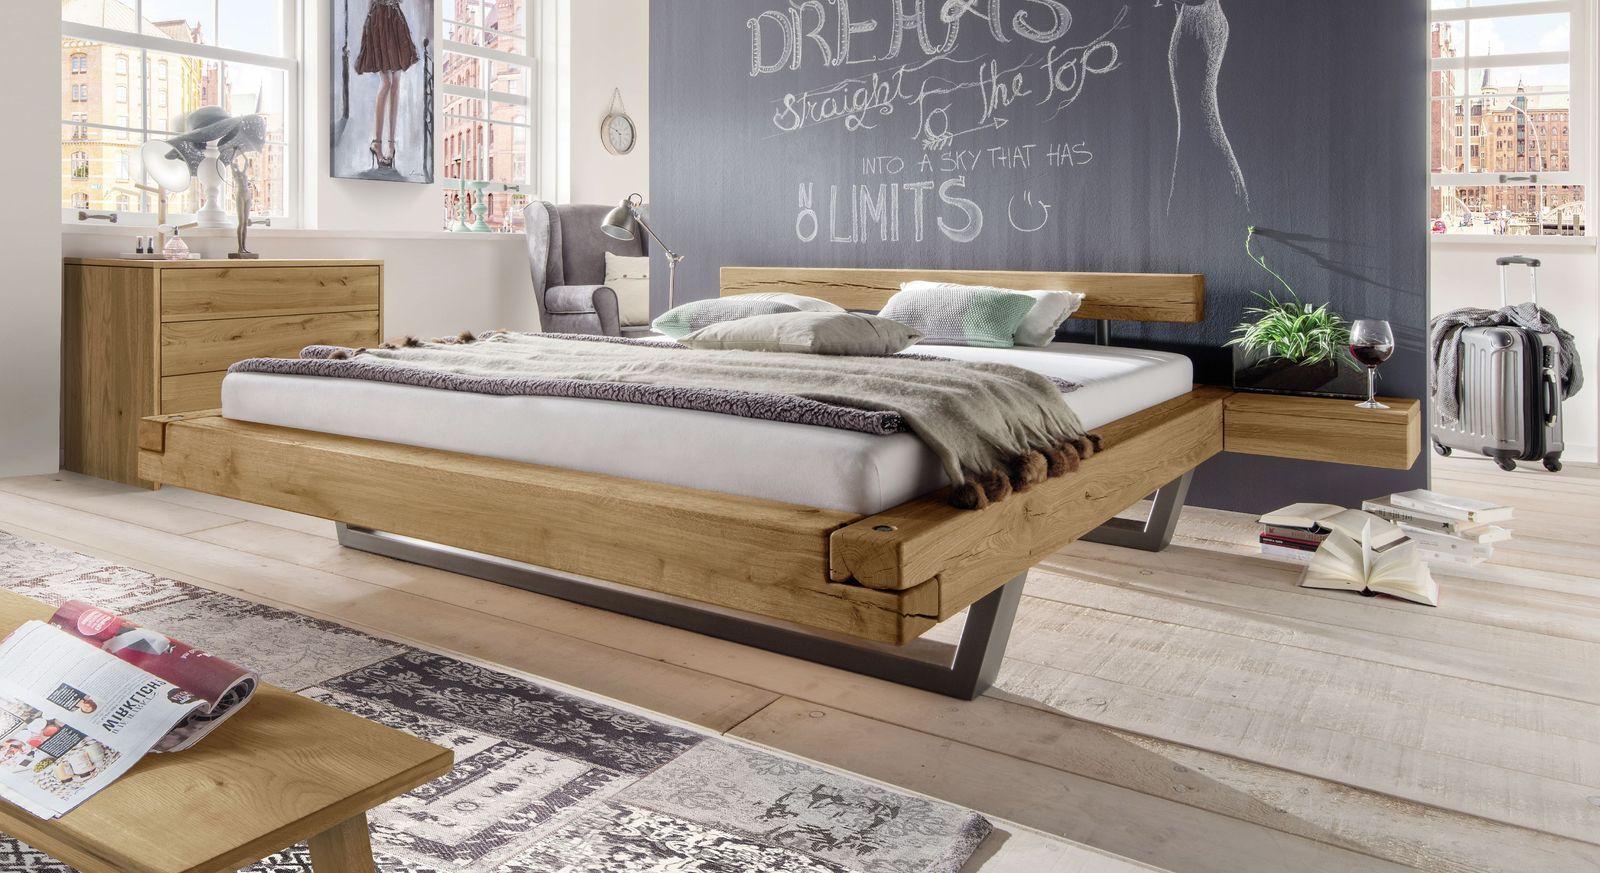 Bett Darica Schwebendes Bett Schwebebett